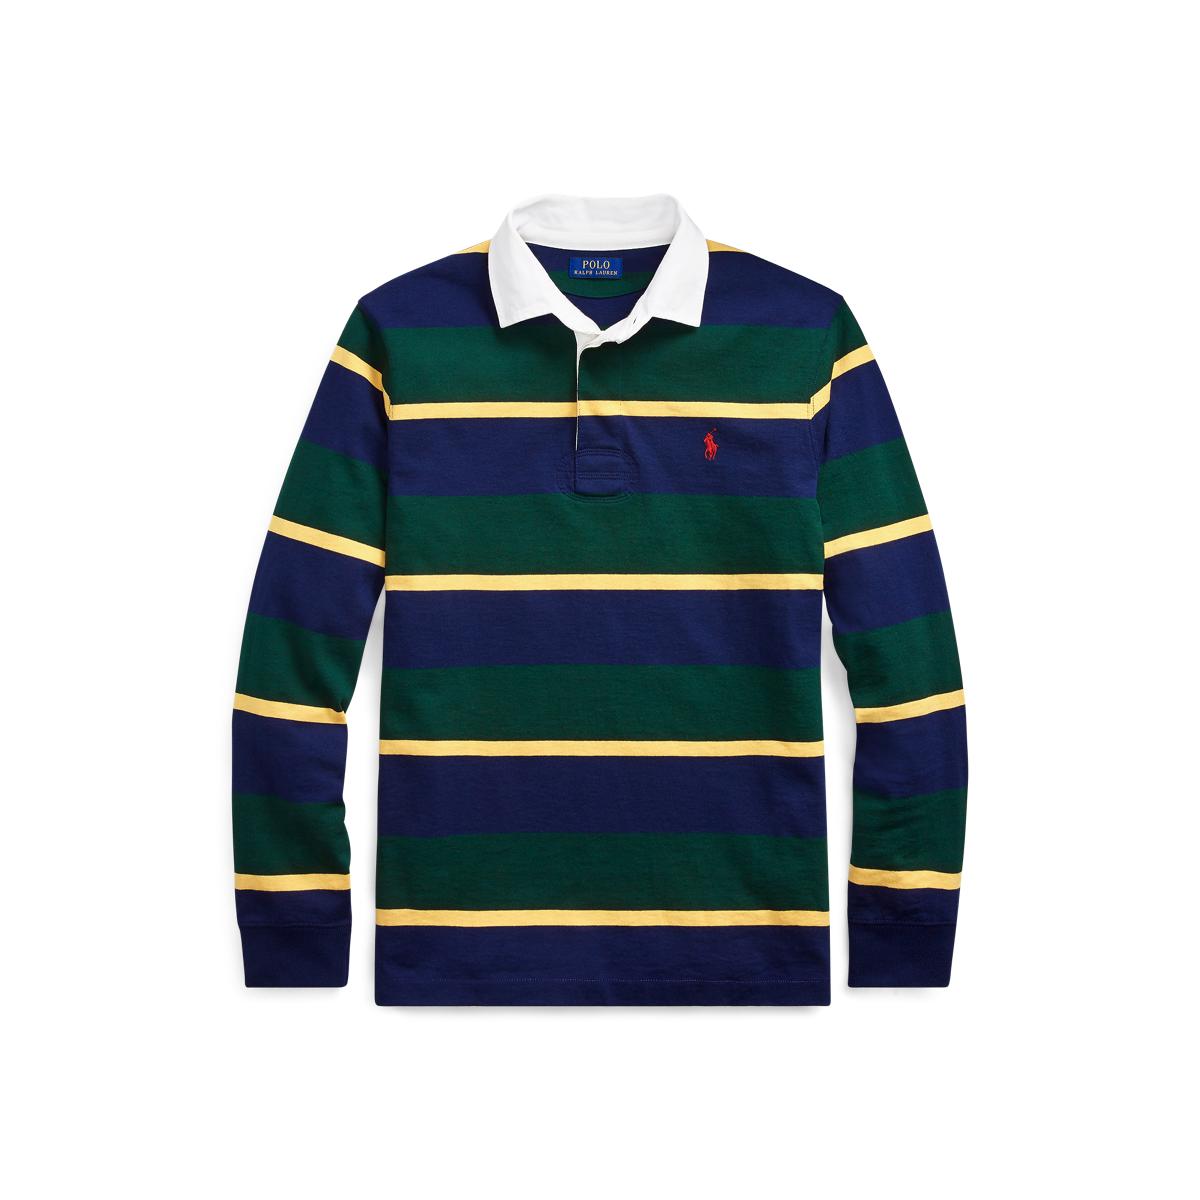 Polo Ralph Lauren Men/'s Purple Green Multi Stripe Rugby Classic Fit Polo Shirt